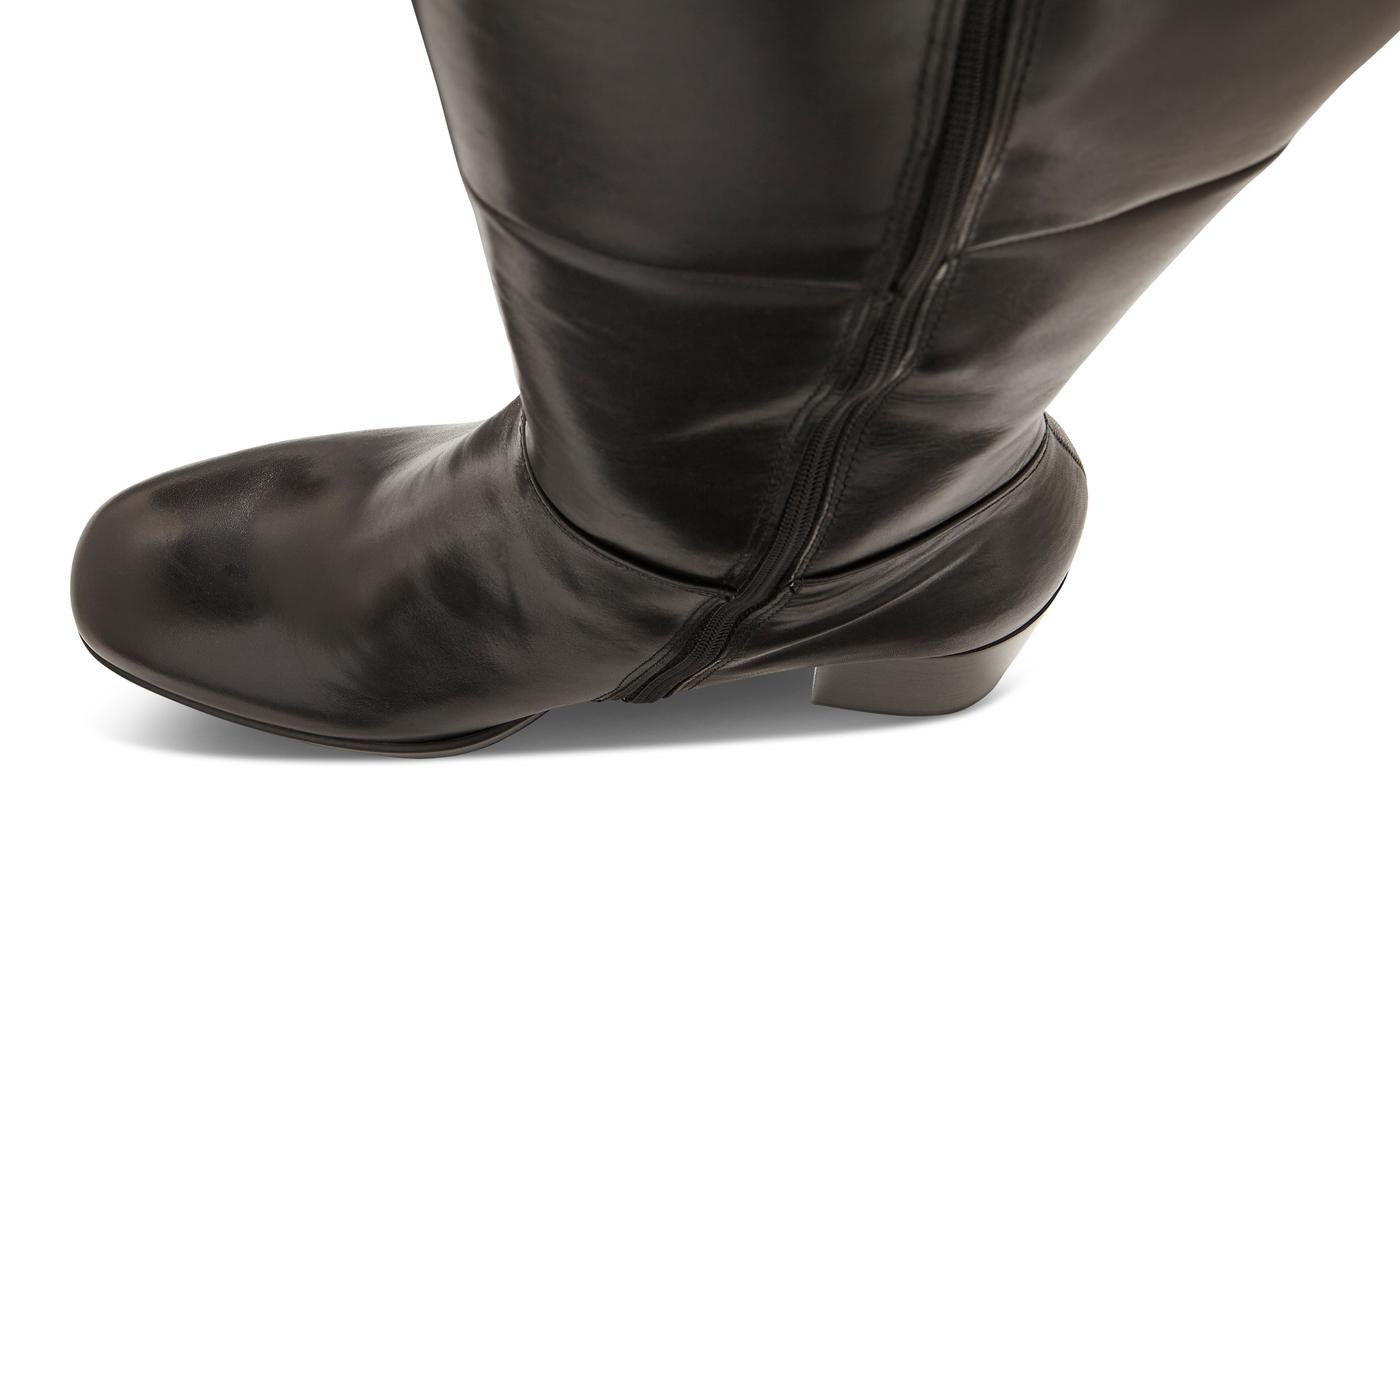 ECCO Shape 55 Chalet Tall Boot